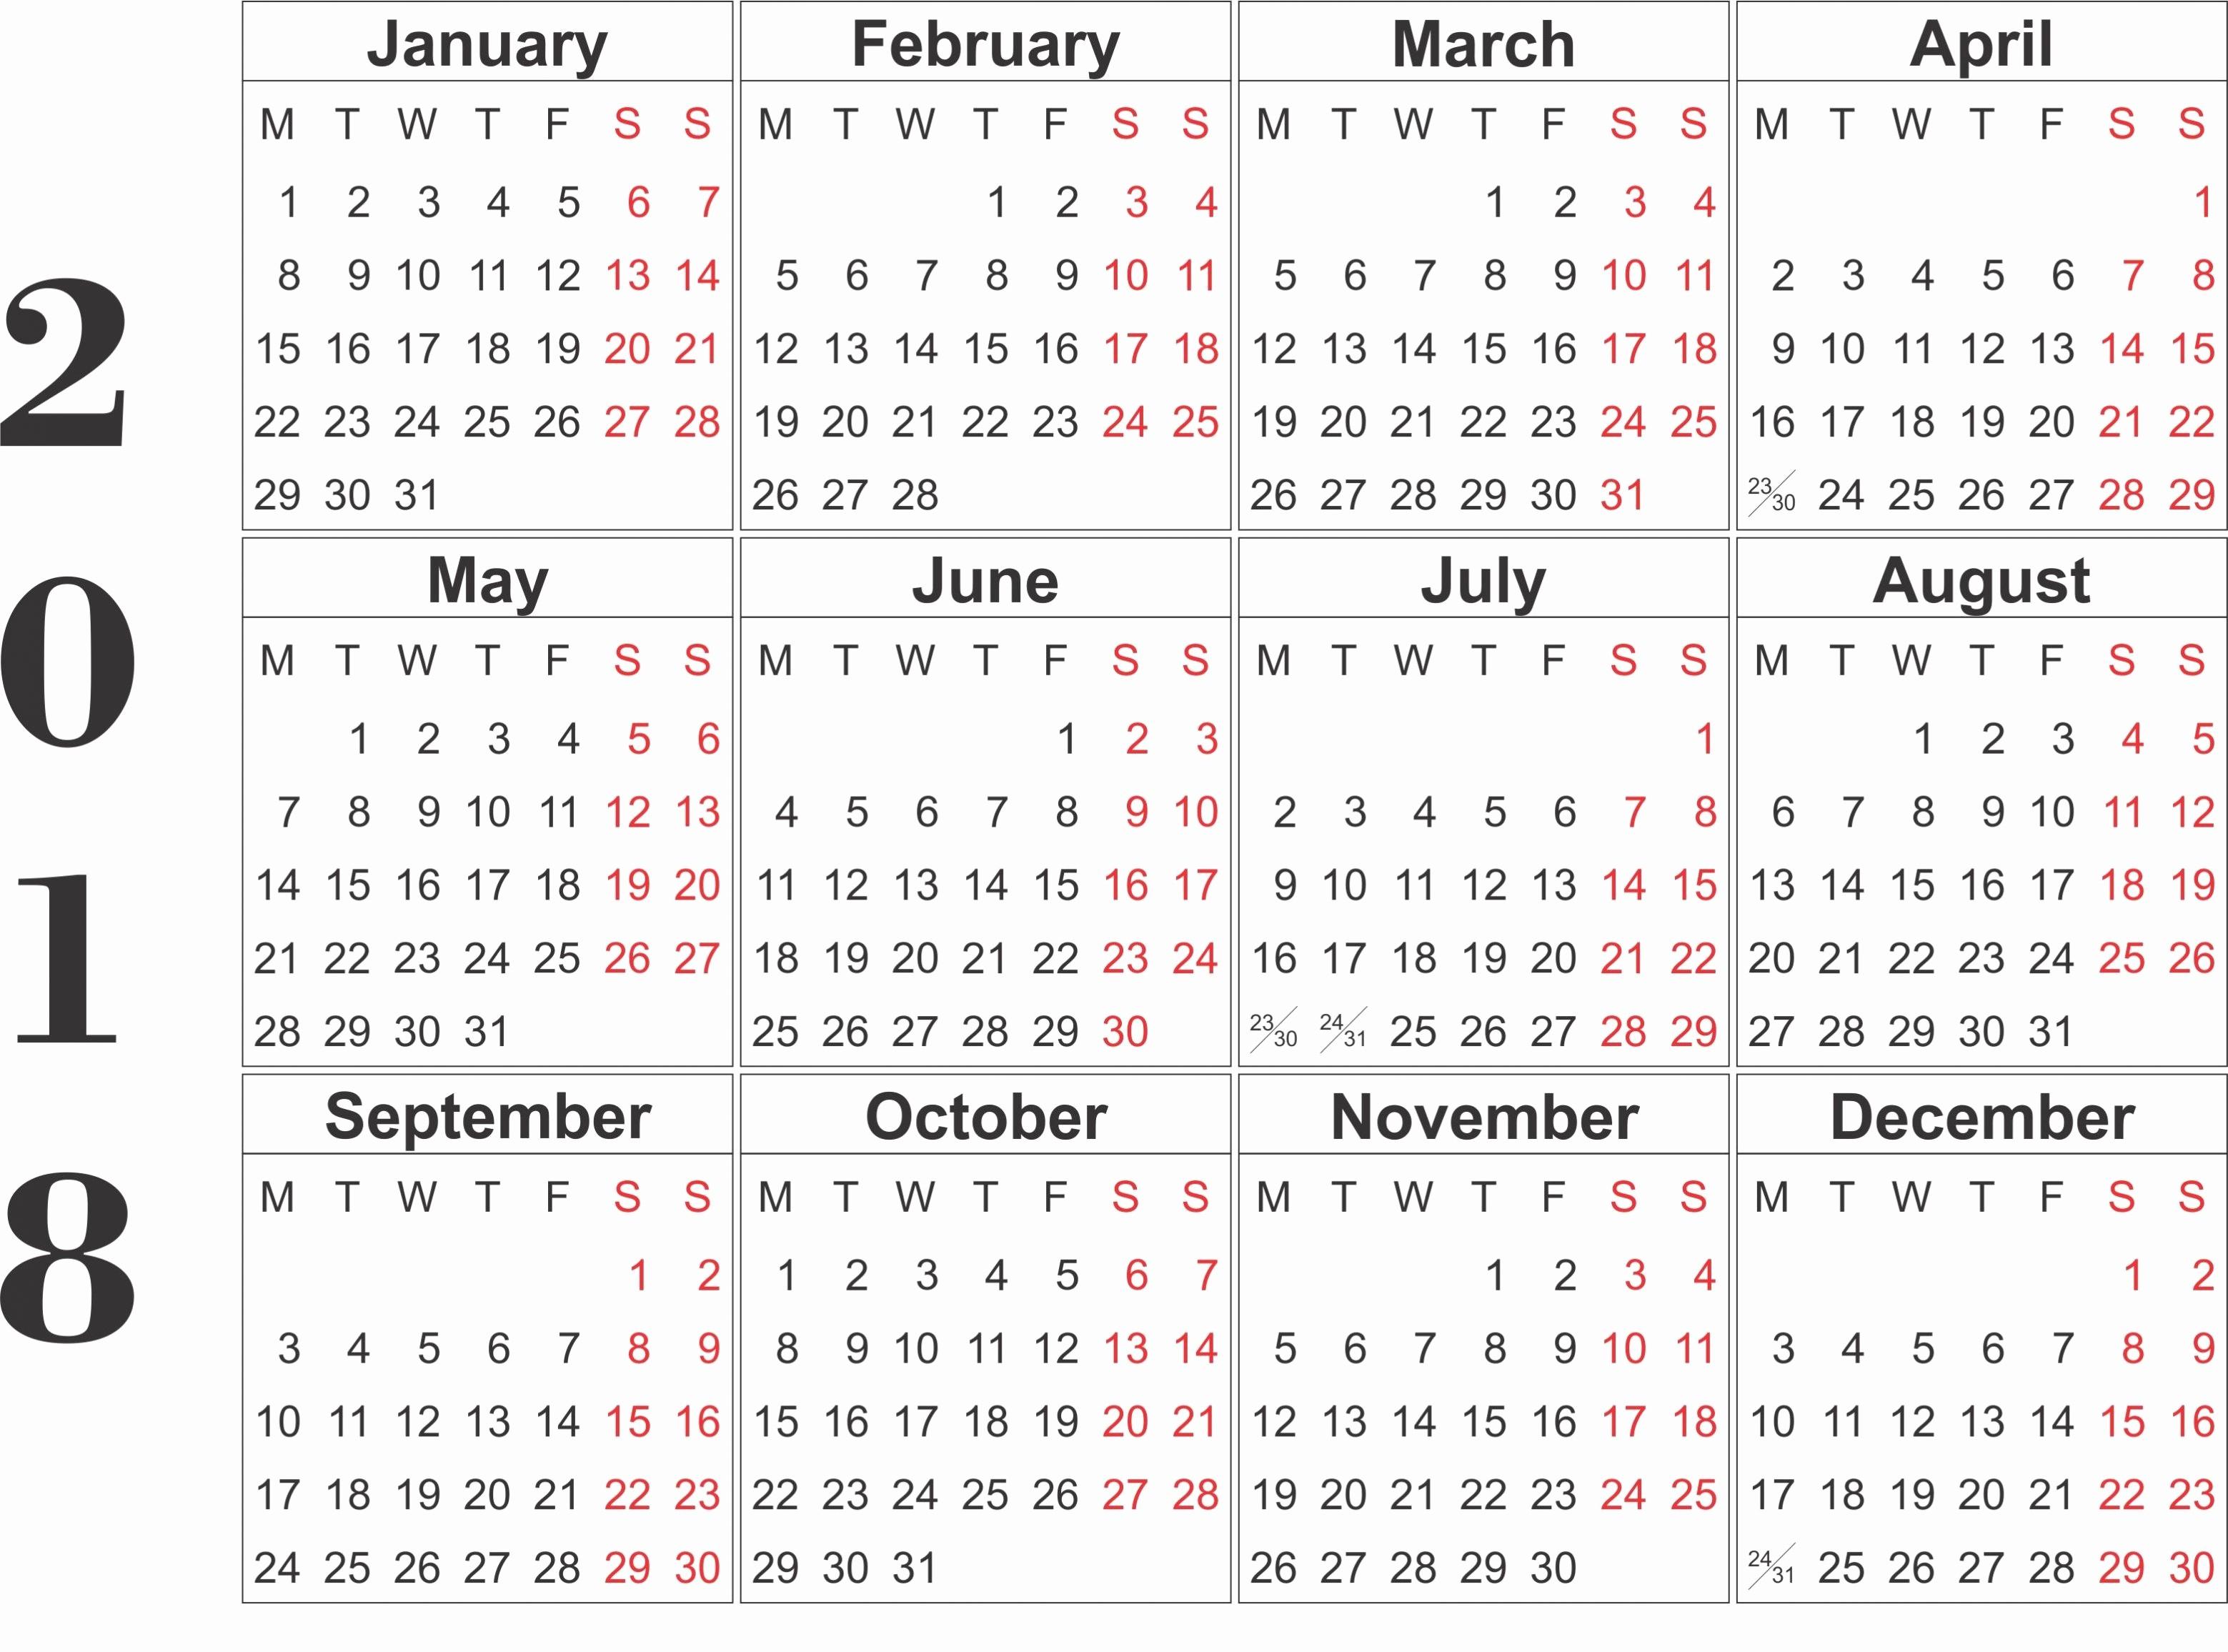 Kalender 2019 Indonesia Pdf Download Mejores Y Más Novedosos Luxury 15 Examples 2018 Calendar Of Kalender 2019 Indonesia Pdf Download Recientes Kalender Ausdrucken Von Bis